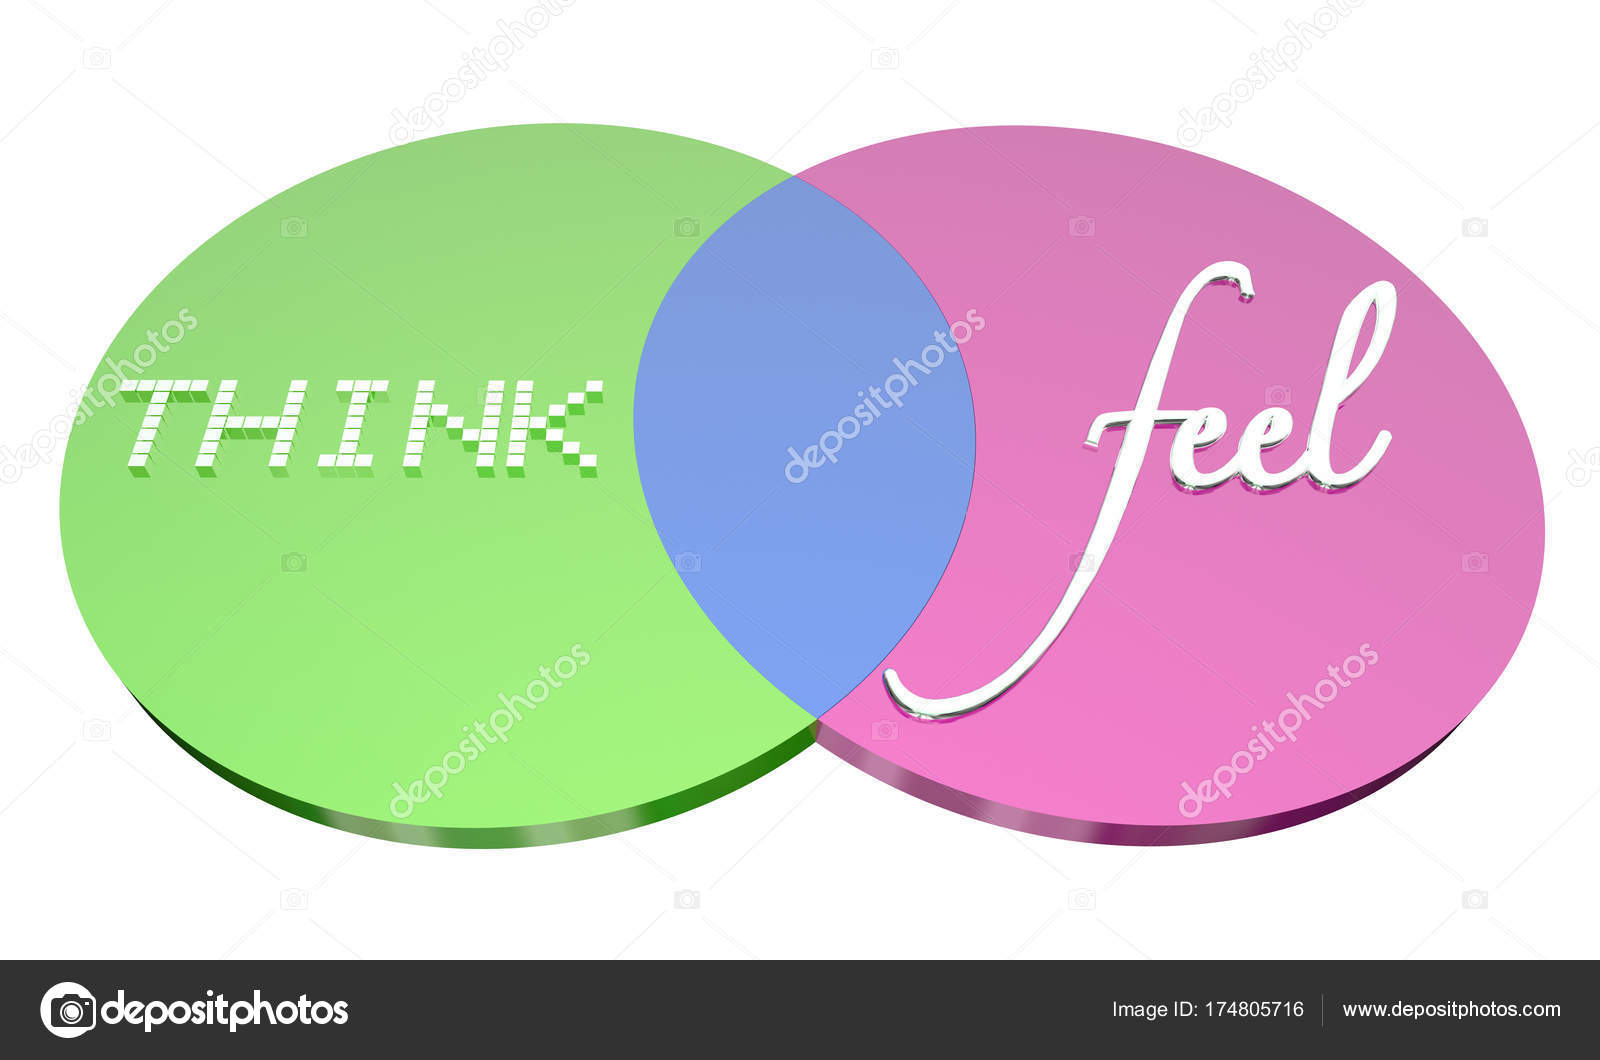 hight resolution of think vs feel venn diagram emotions logic stock photo